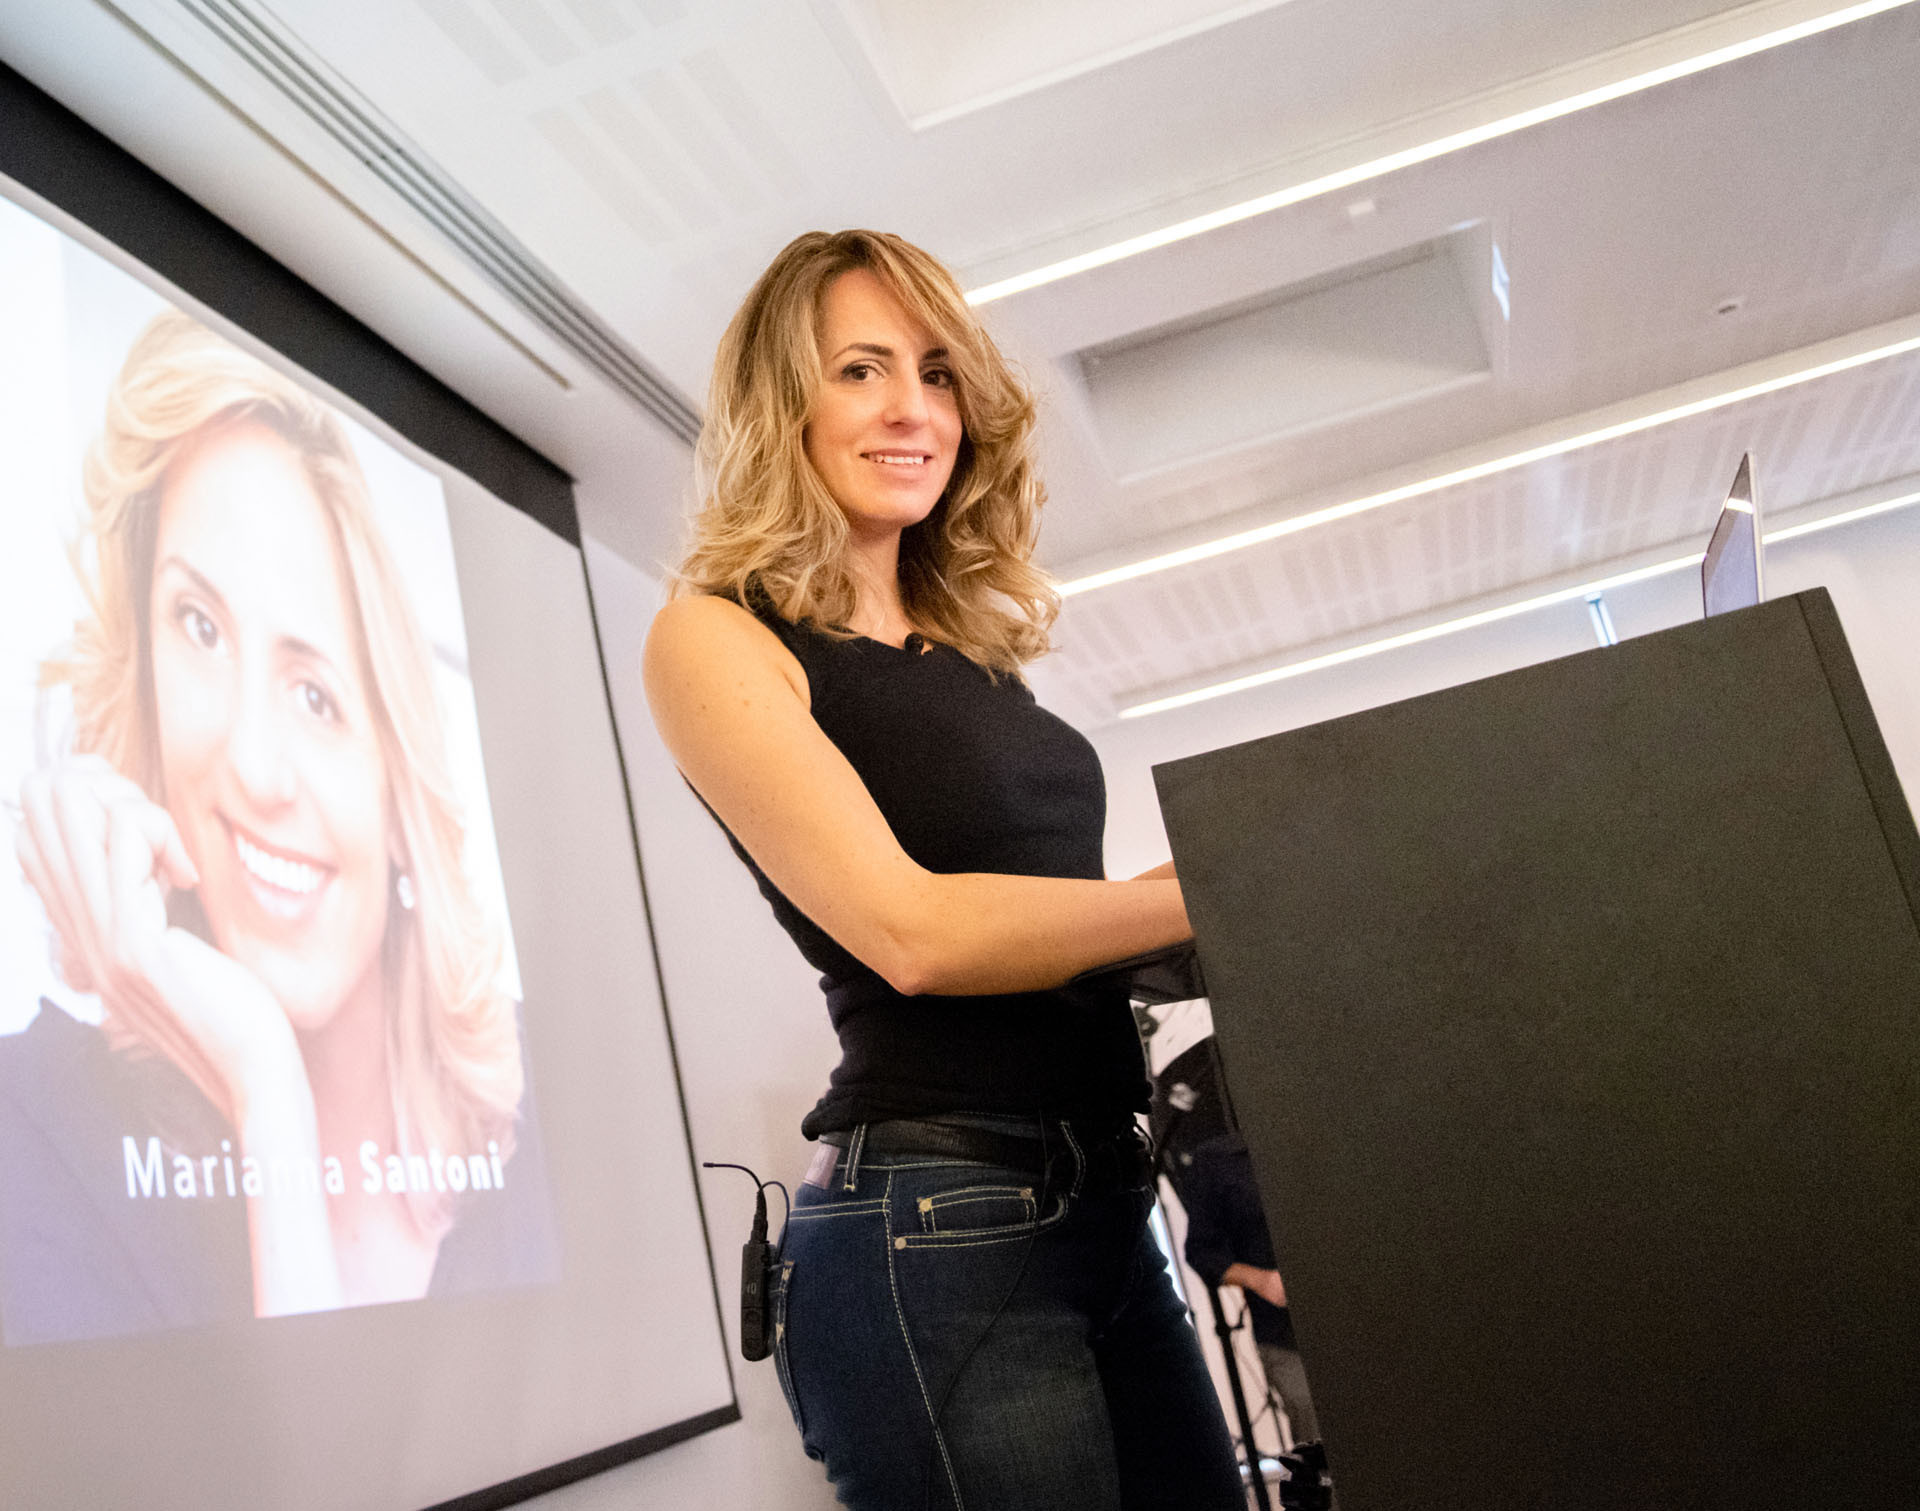 Marianna Santoni public speaker